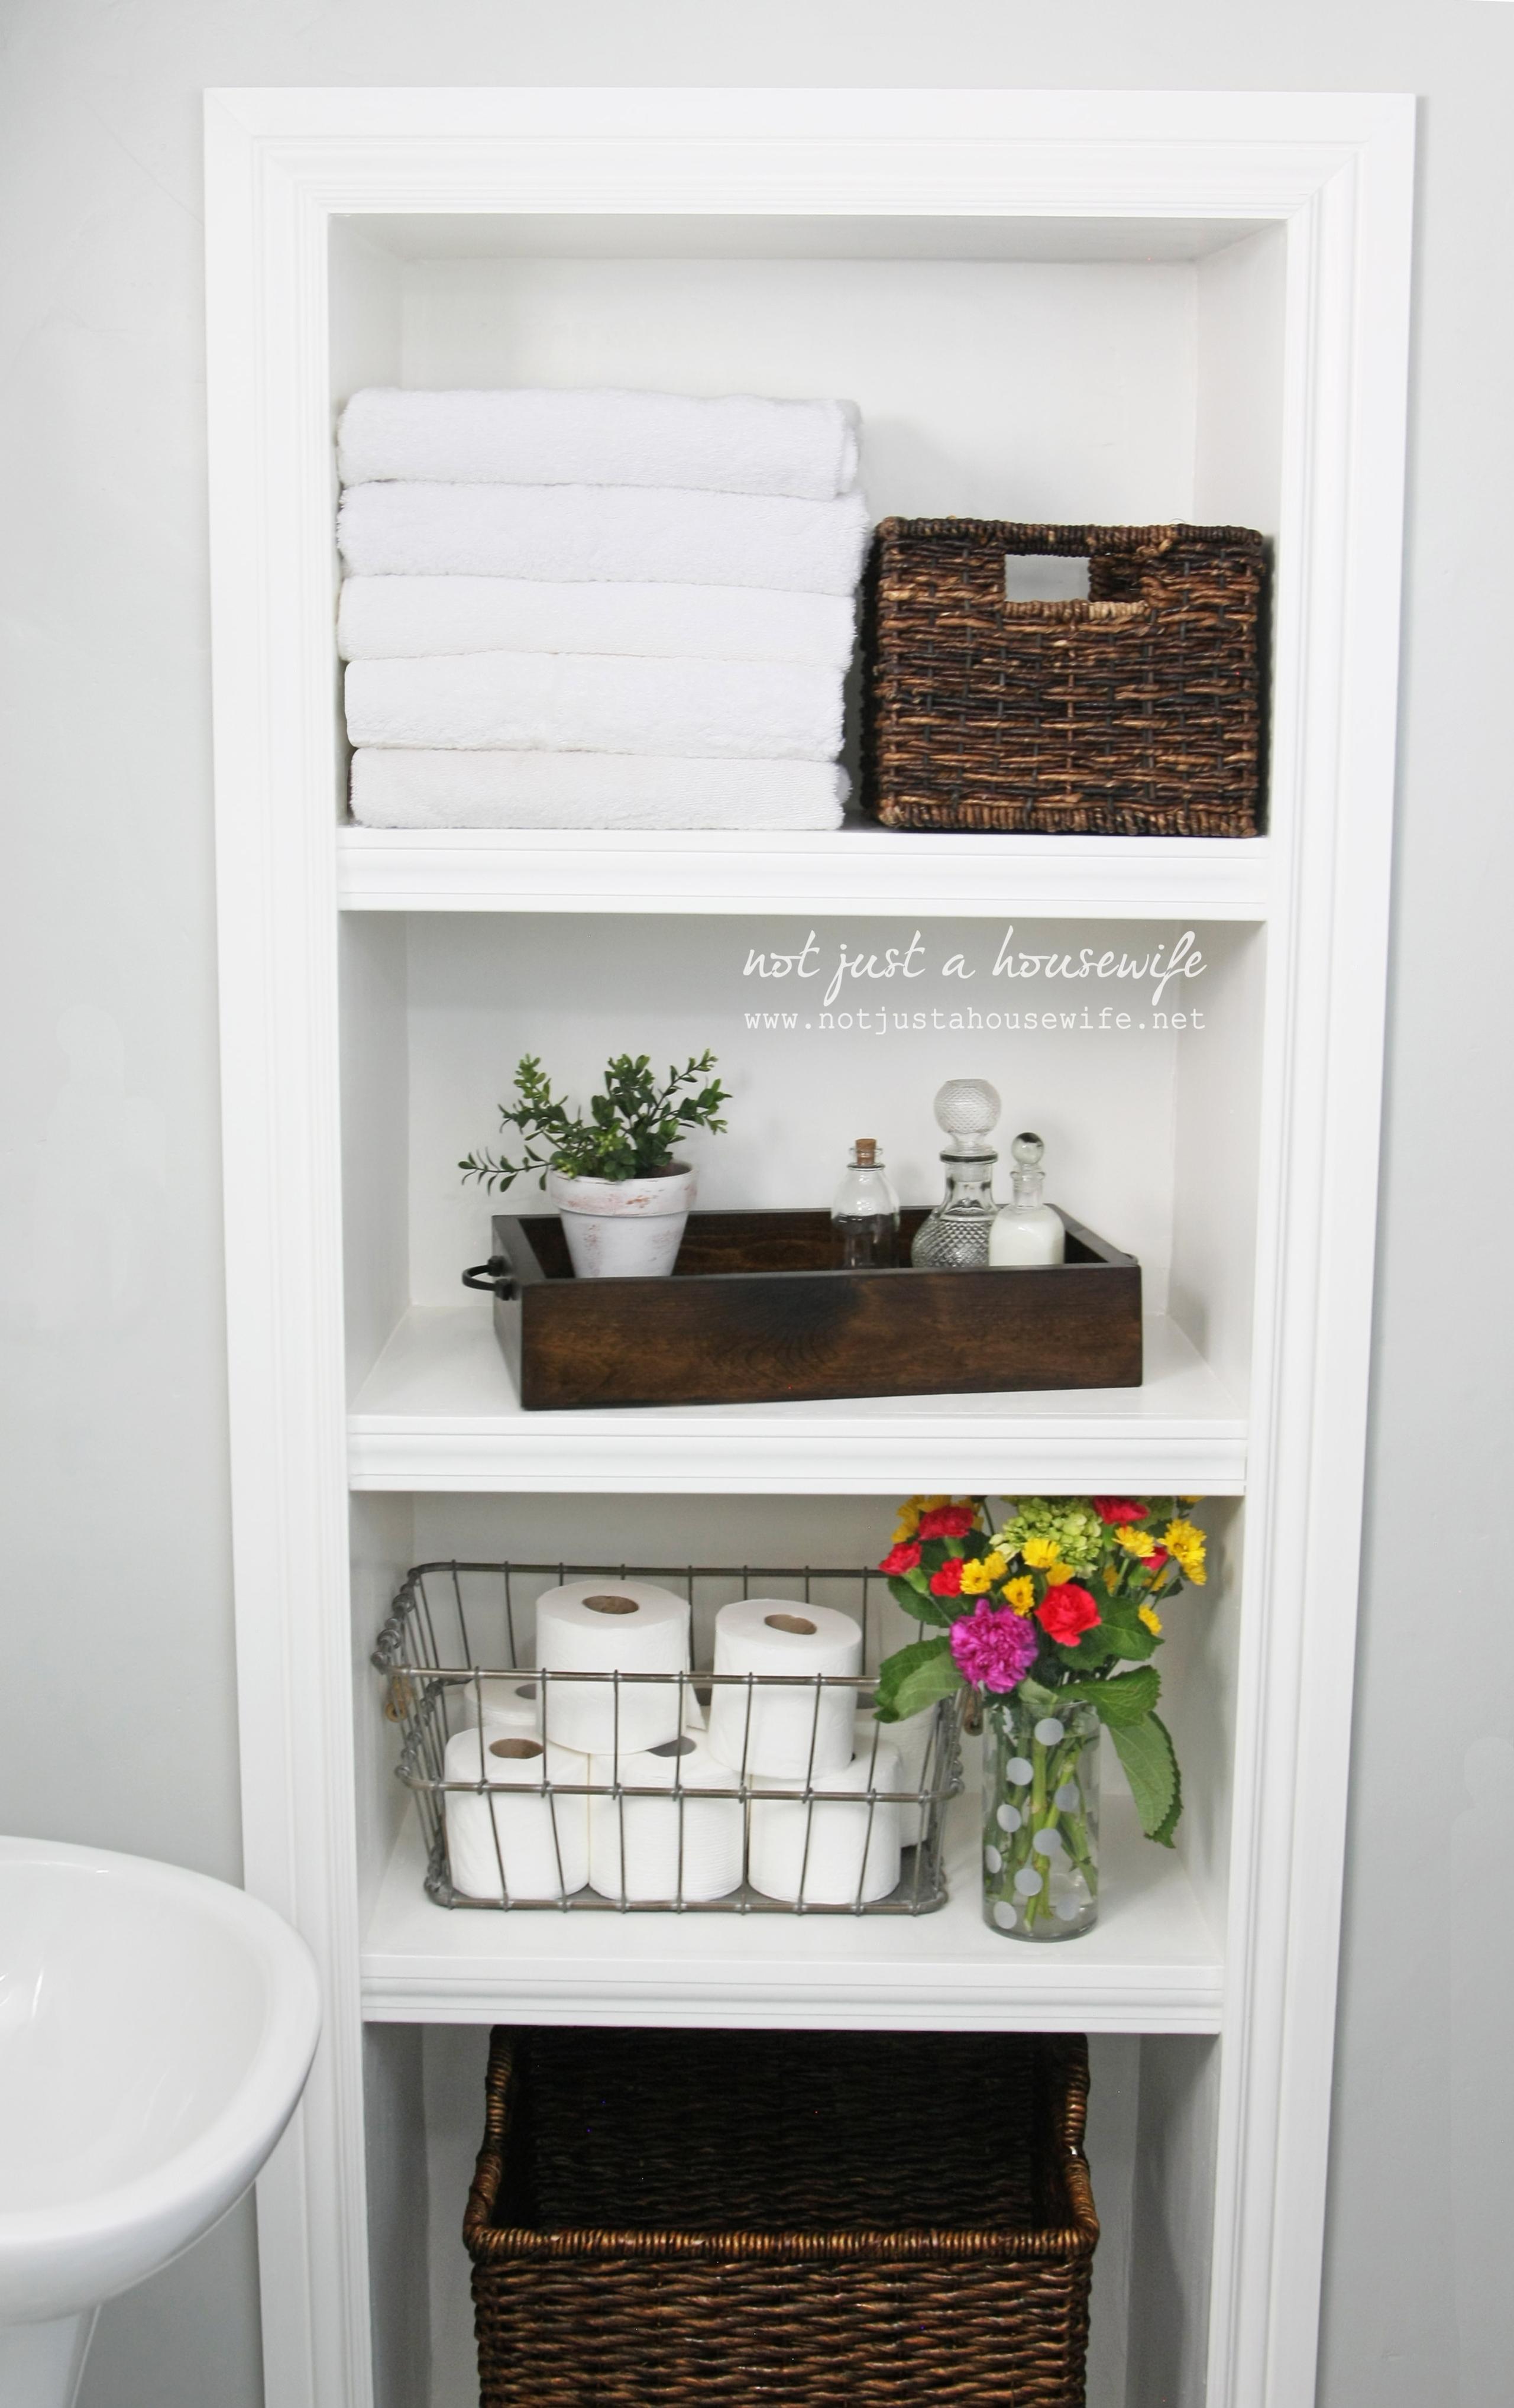 Gentil Bathroom Wall Storage Shelves